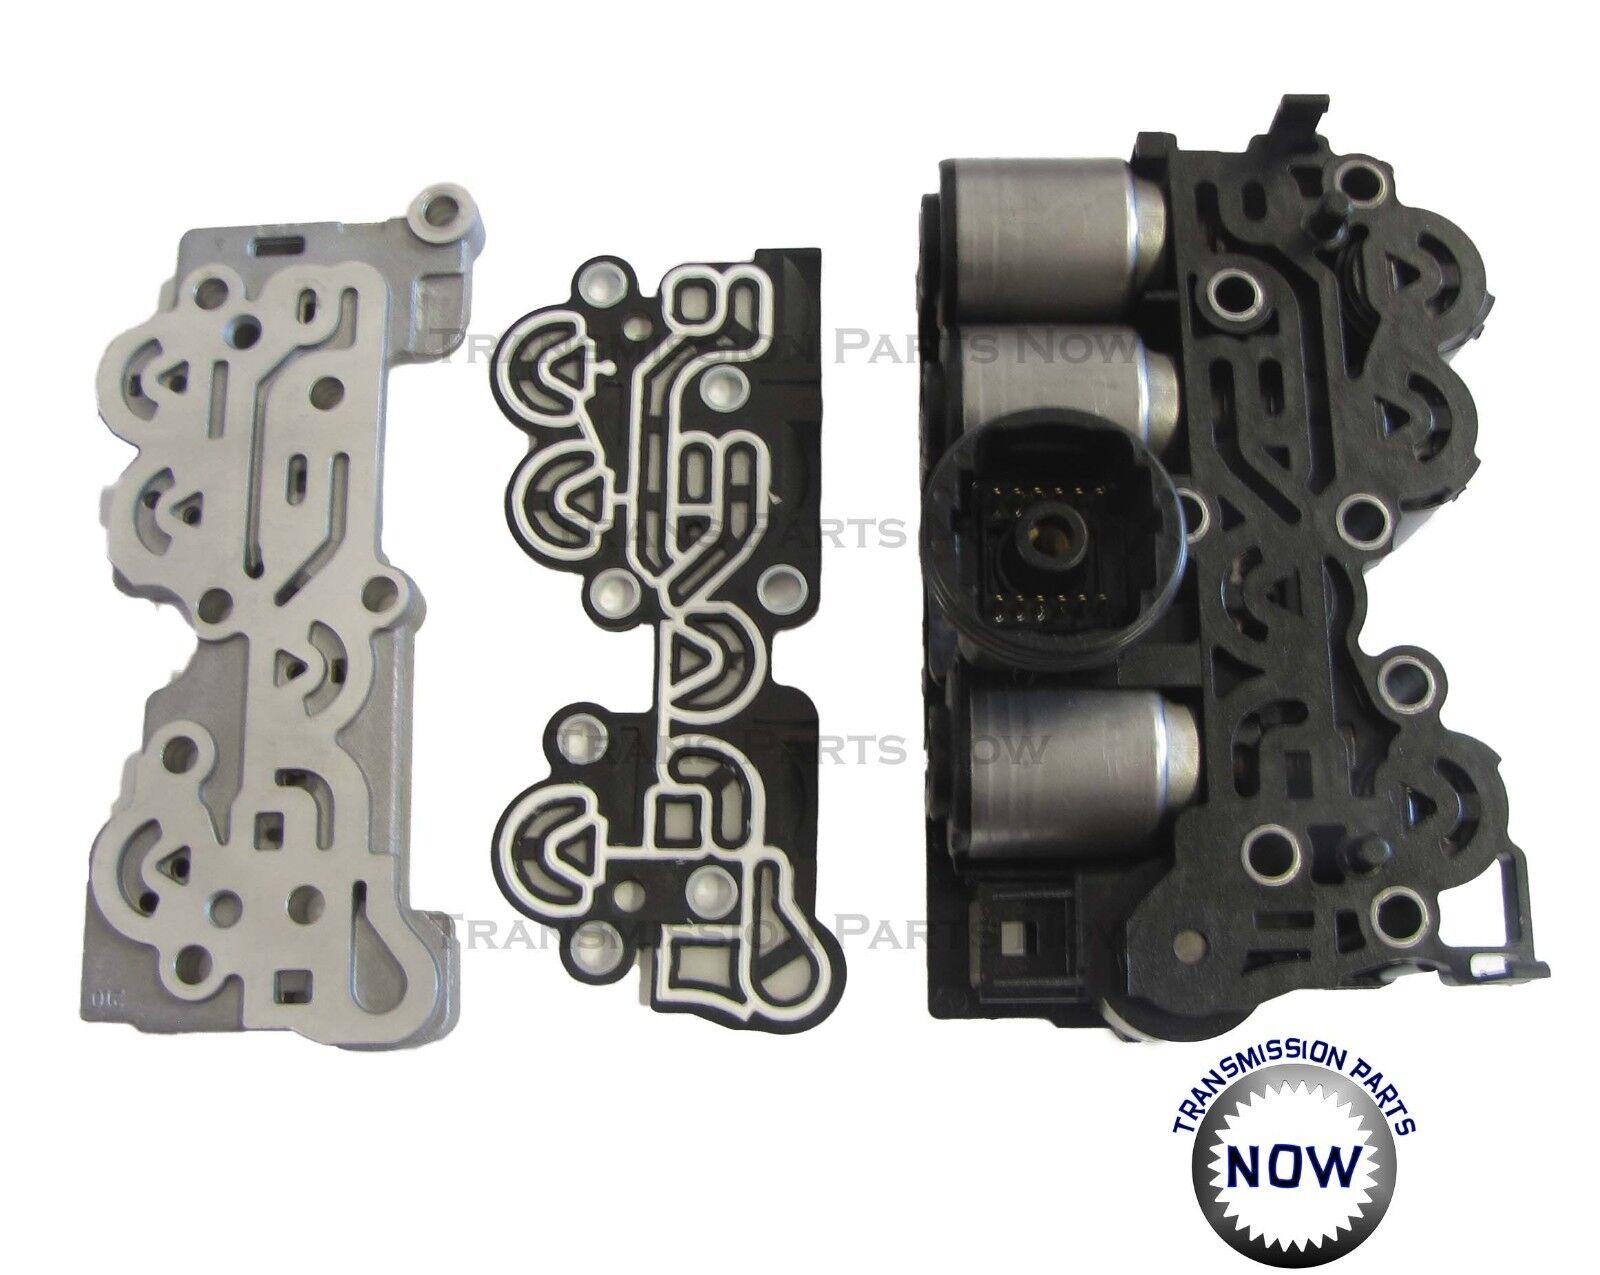 5r55s transmission 5r55s 5r55w ford transmission solenoid block pack explorer mercury reman r46420b